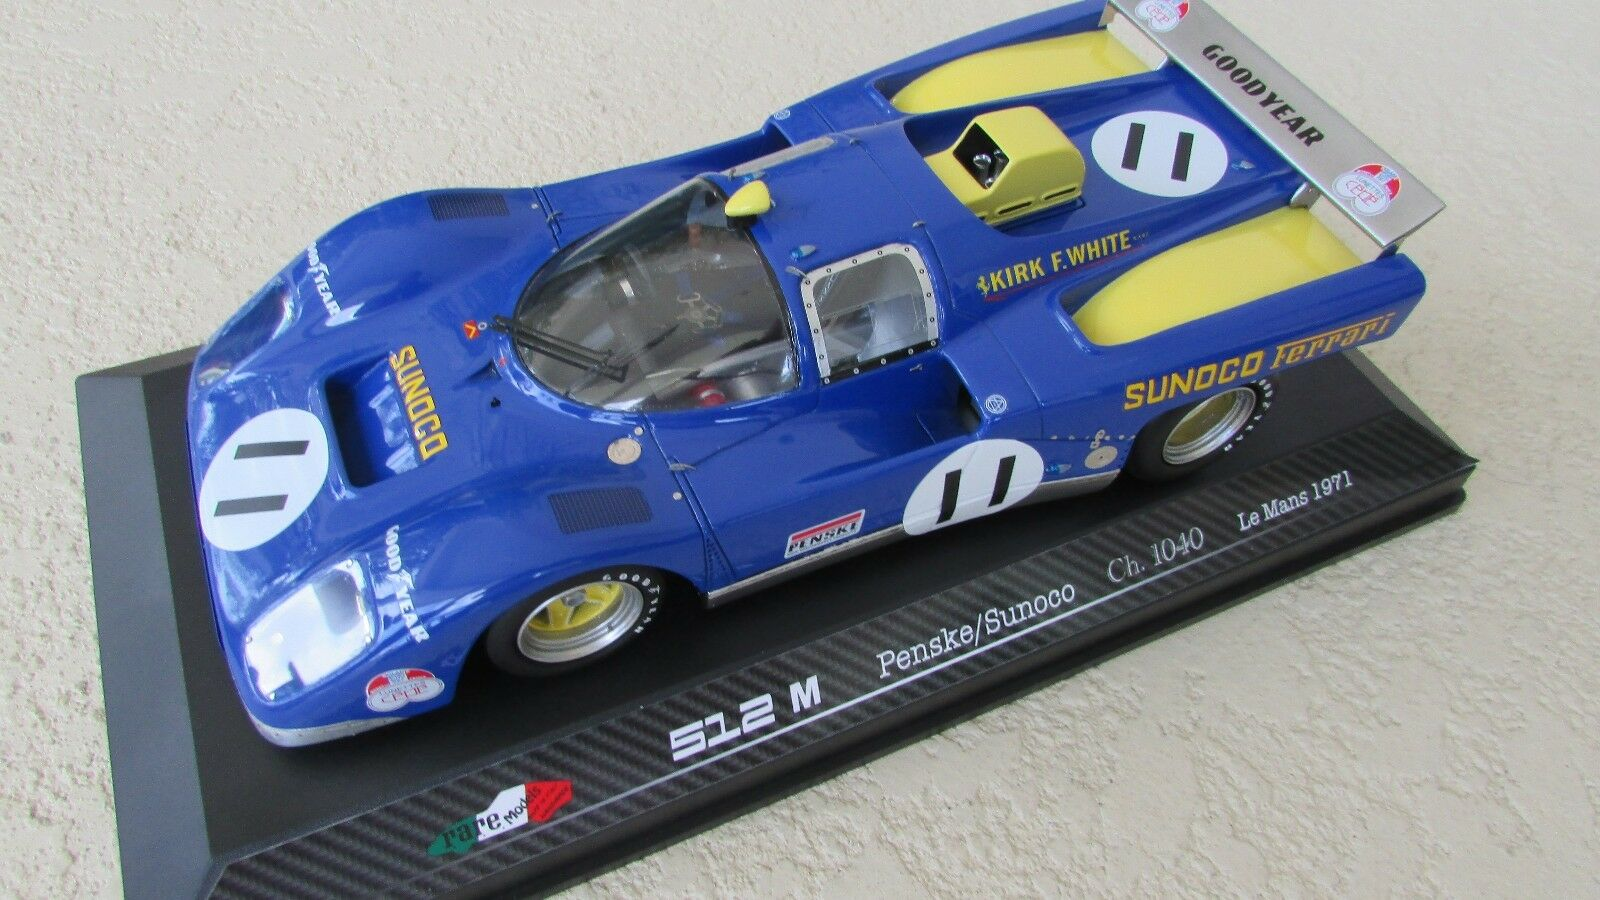 1971 Ferrari 512 M Penske Sunoco Donohue Hobbs race car Le Mans 24  1 18